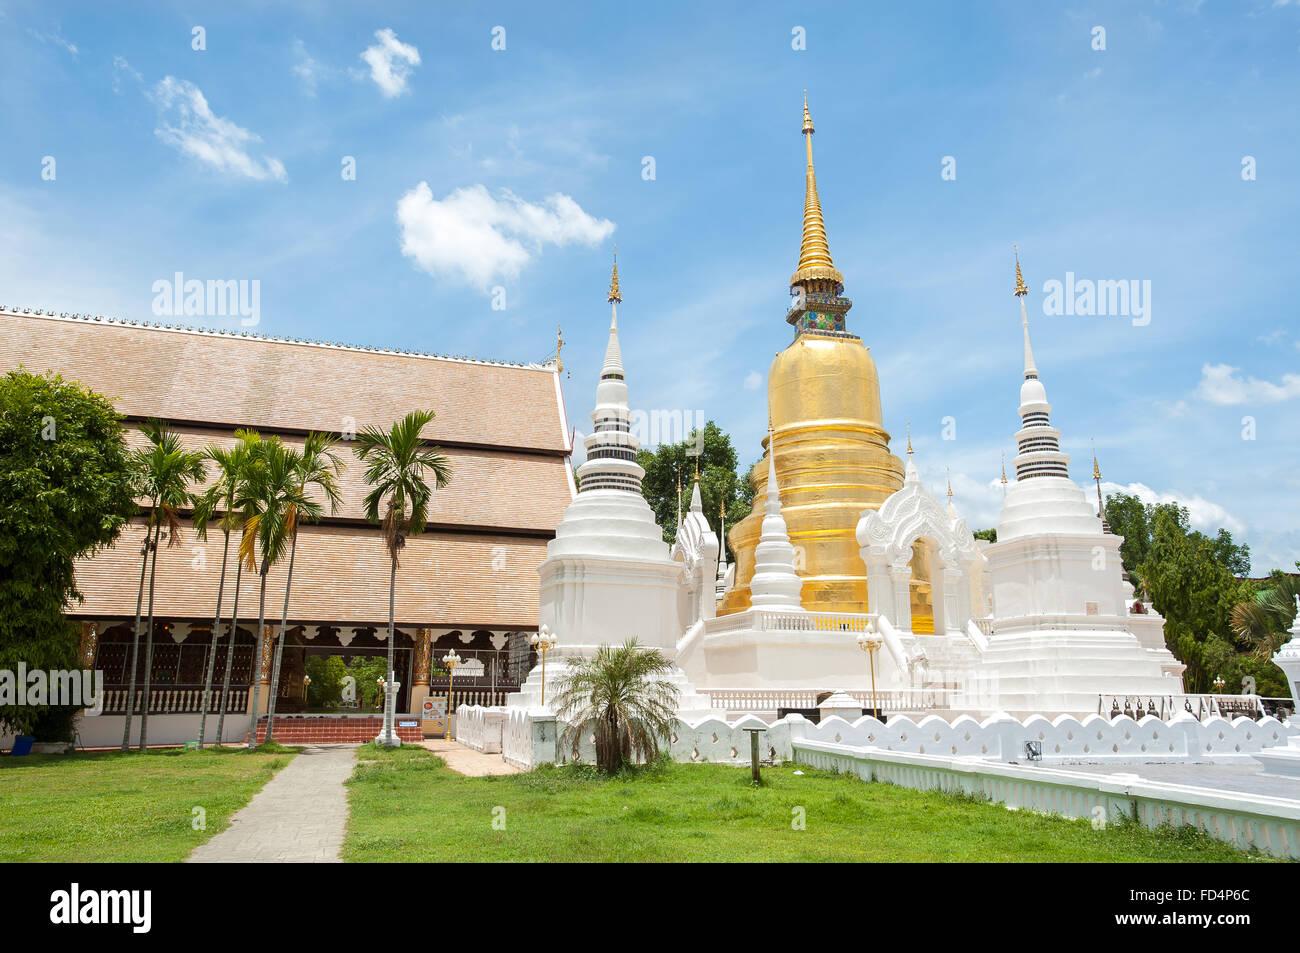 Außenaufnahme des Wat Suan Dok, Chiang Mai, Thailand Stockbild